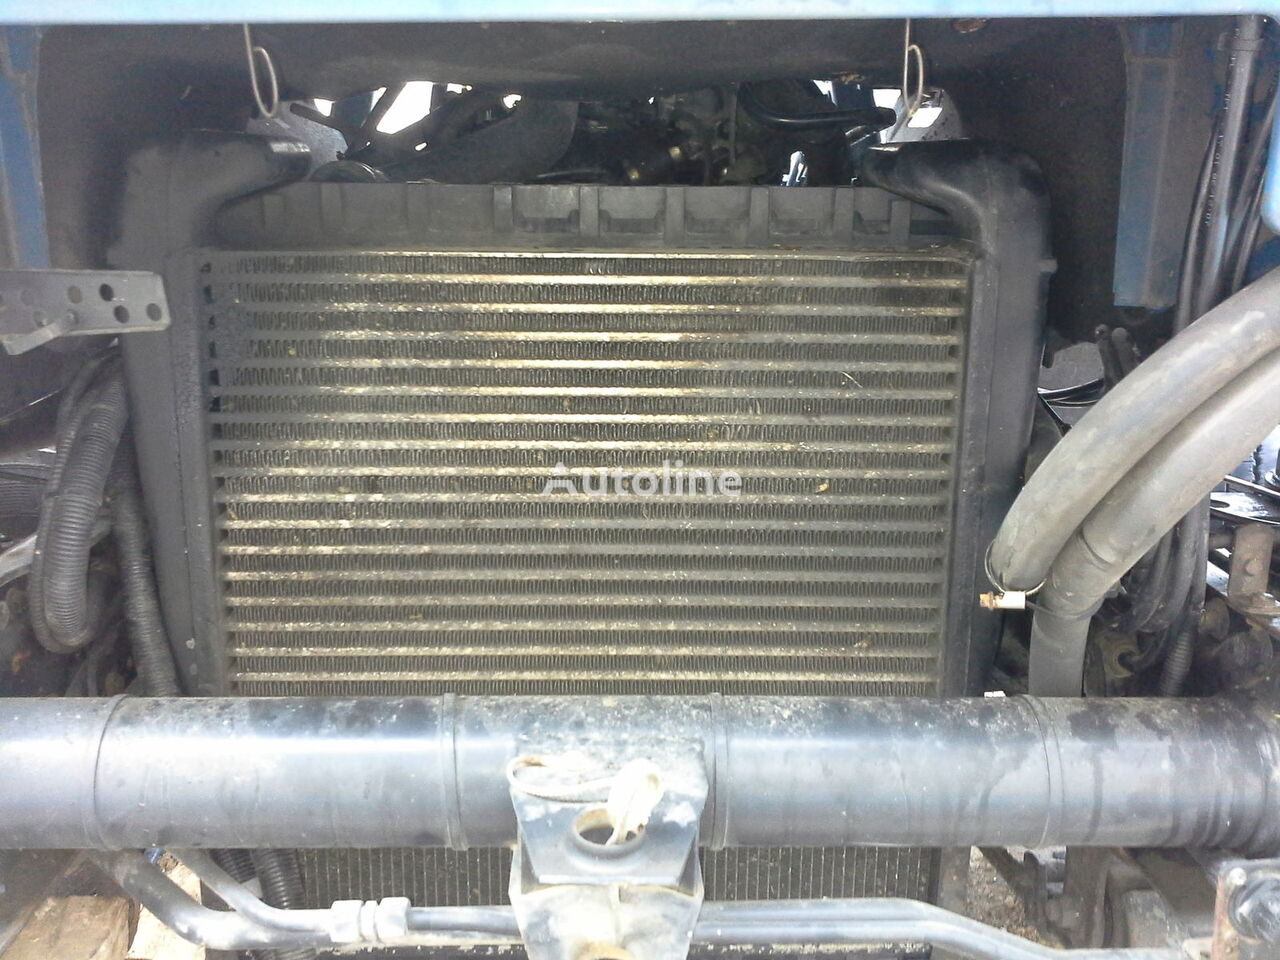 radiátor MAN Interkuller na vsi modeli MAN pro nákladní vozidla MAN L2000 M2000 TGL TGA TGX TGS F2000 TGM komandor